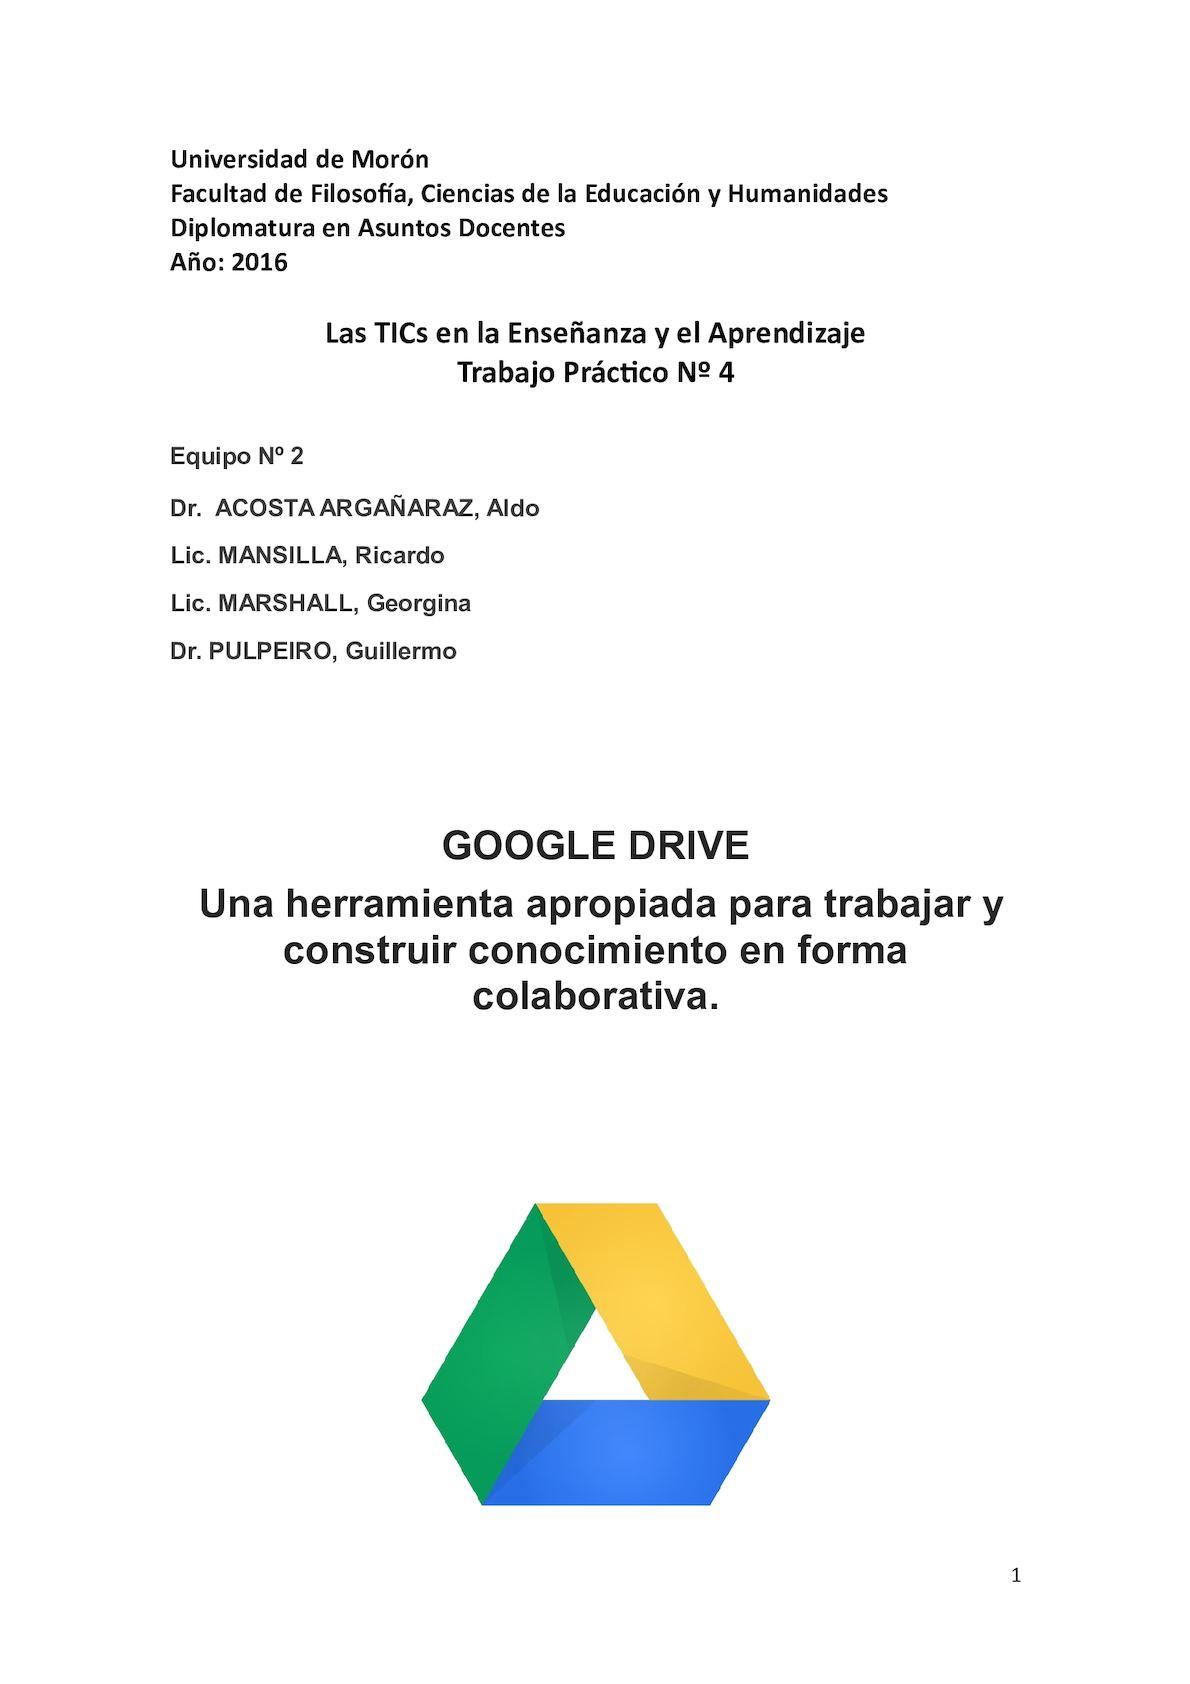 Tutorial Google Drive